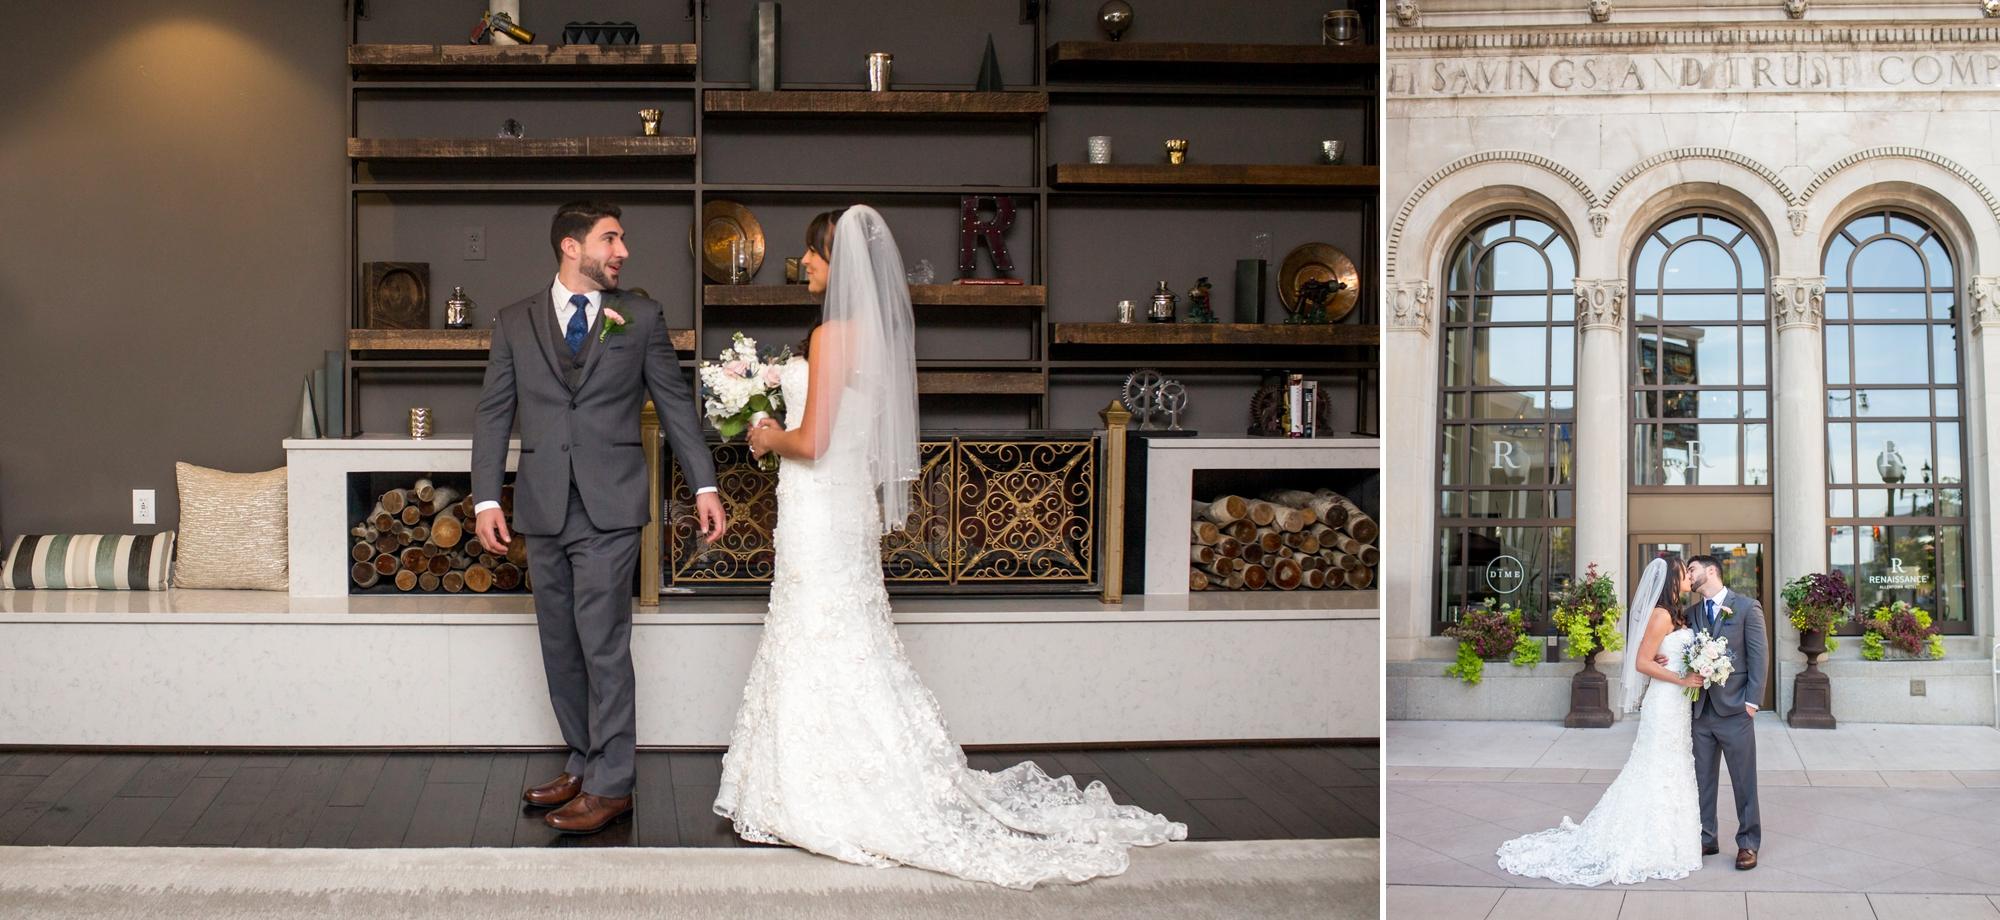 Best of 2016 | Allentown, PA Wedding at Renaissance Allentown Hotel | CT, NYC, New England + Destination Luxury Wedding + Engagement Photographer | Shaina Lee Photography